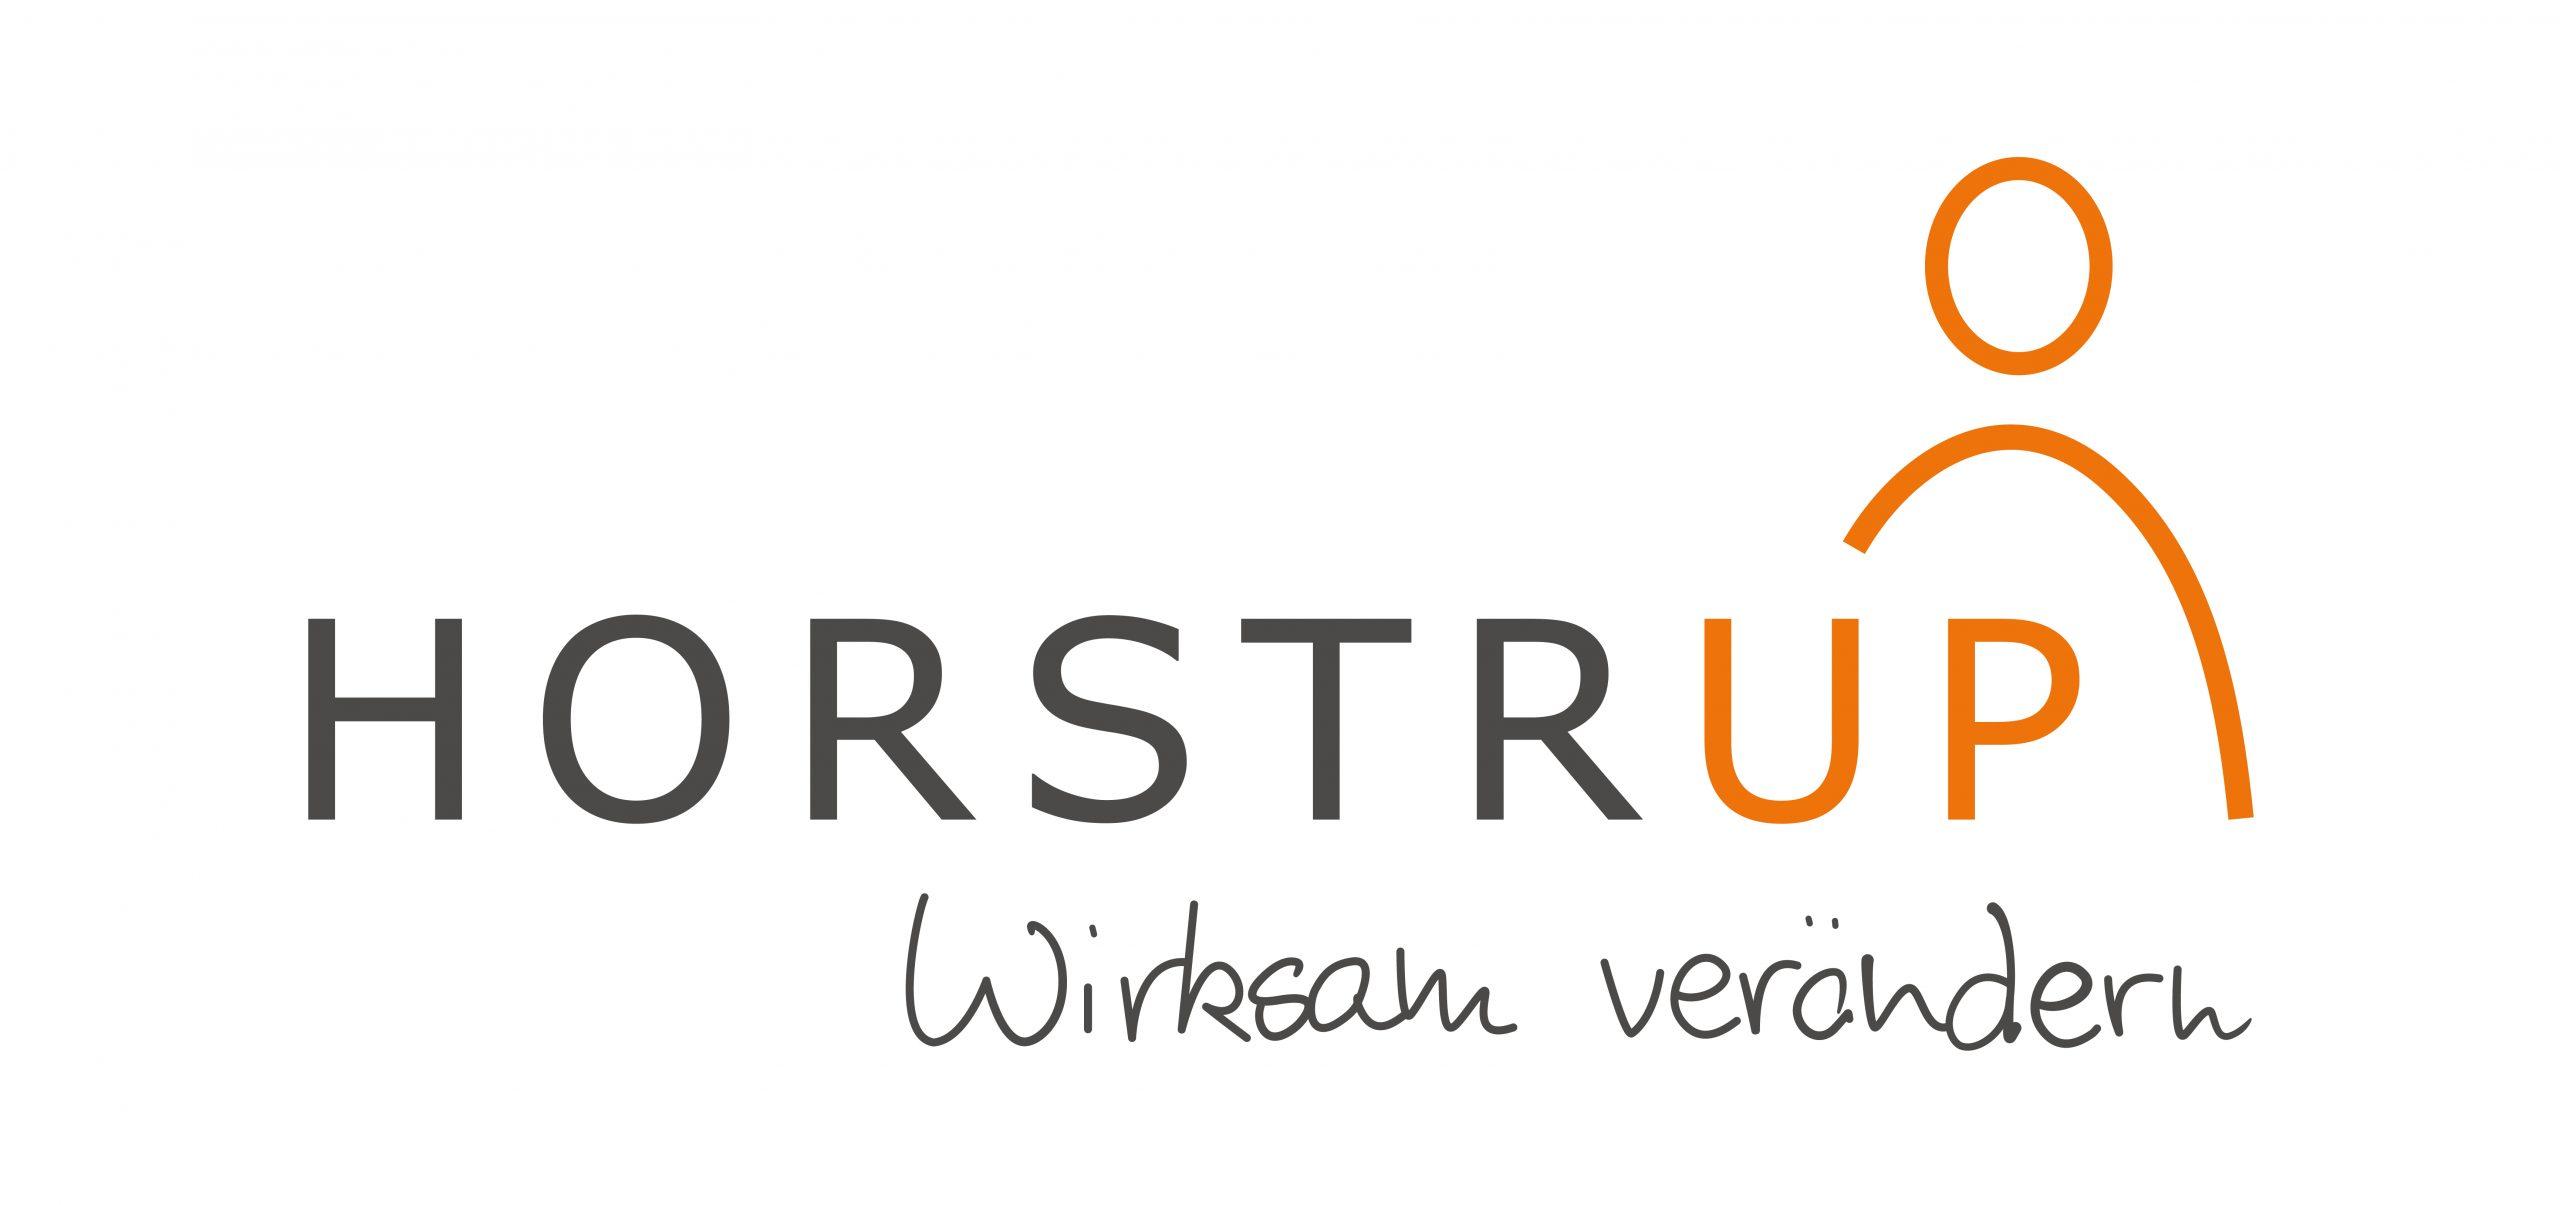 Horstrup